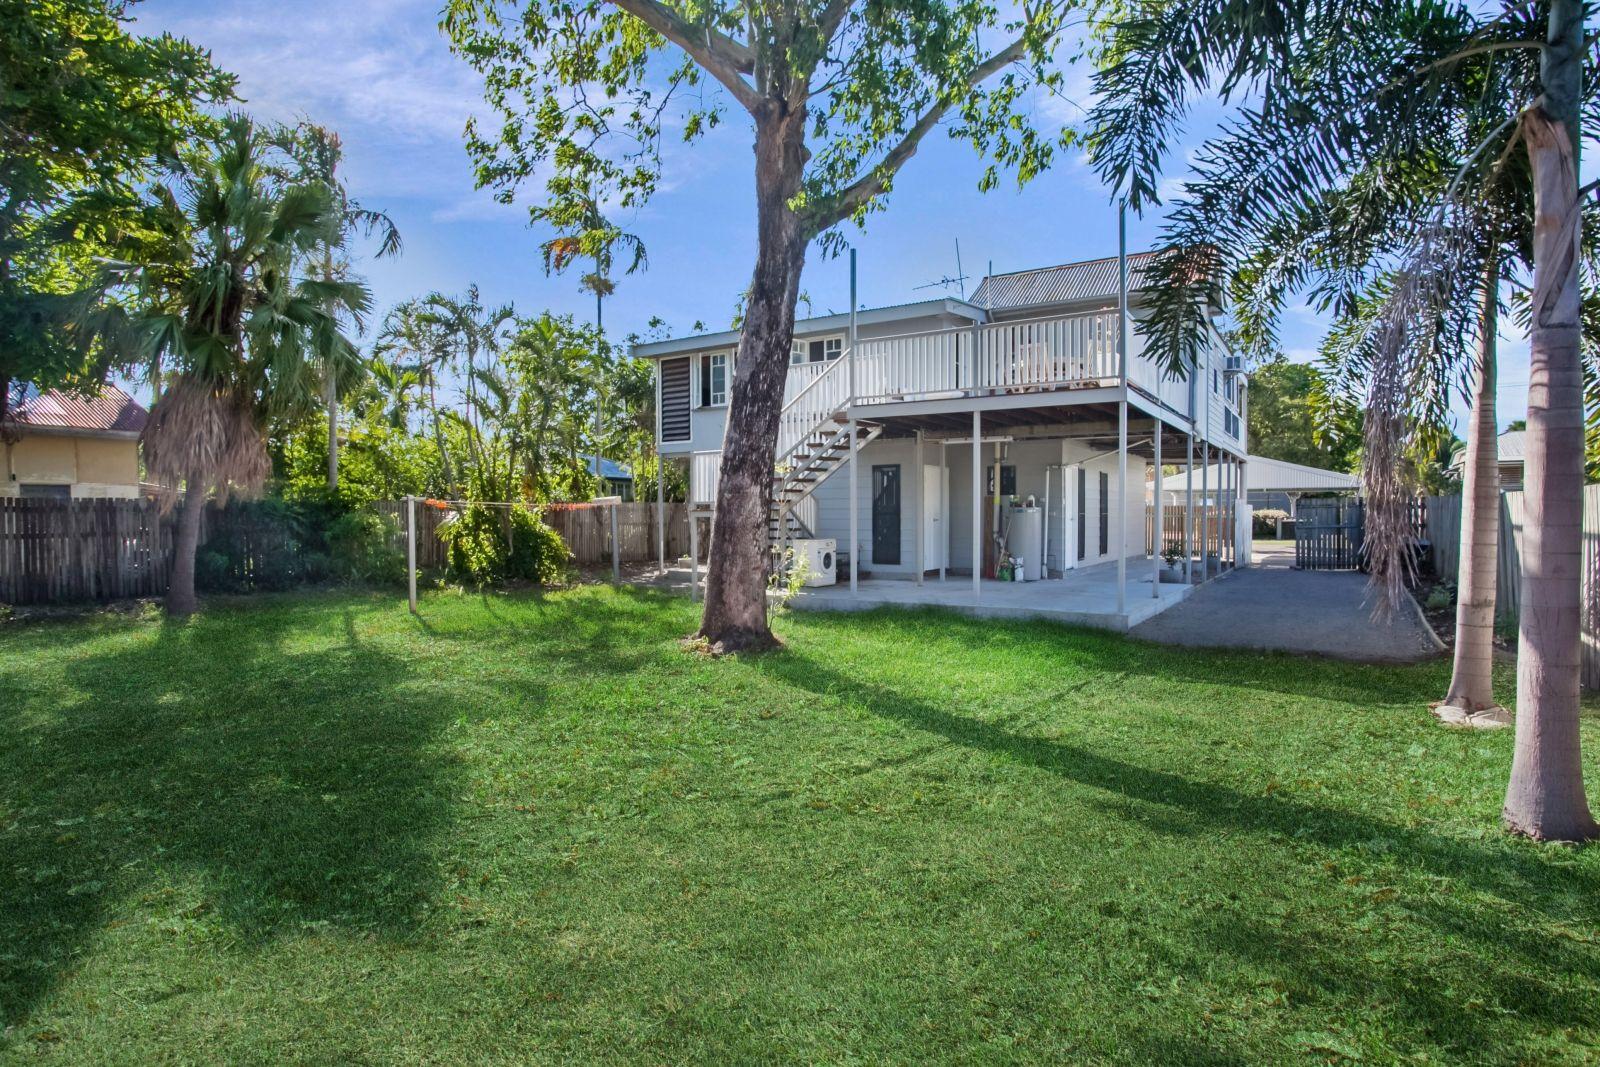 1/41 Norris Street, Hermit Park QLD 4812, Image 5